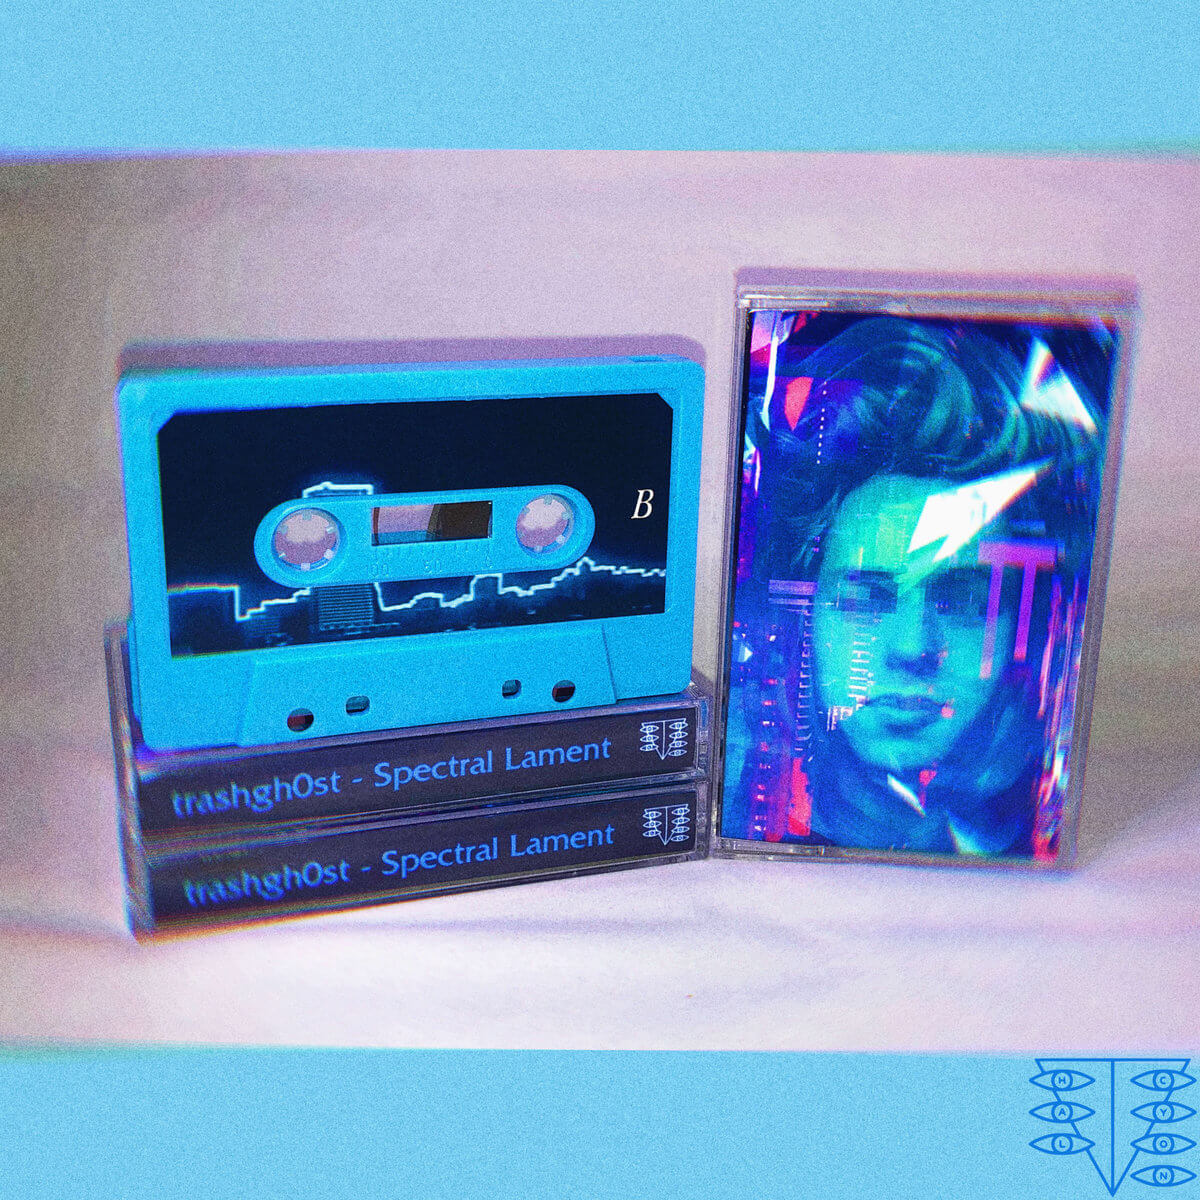 Spectral Lament by trashgh0st (Cassette)